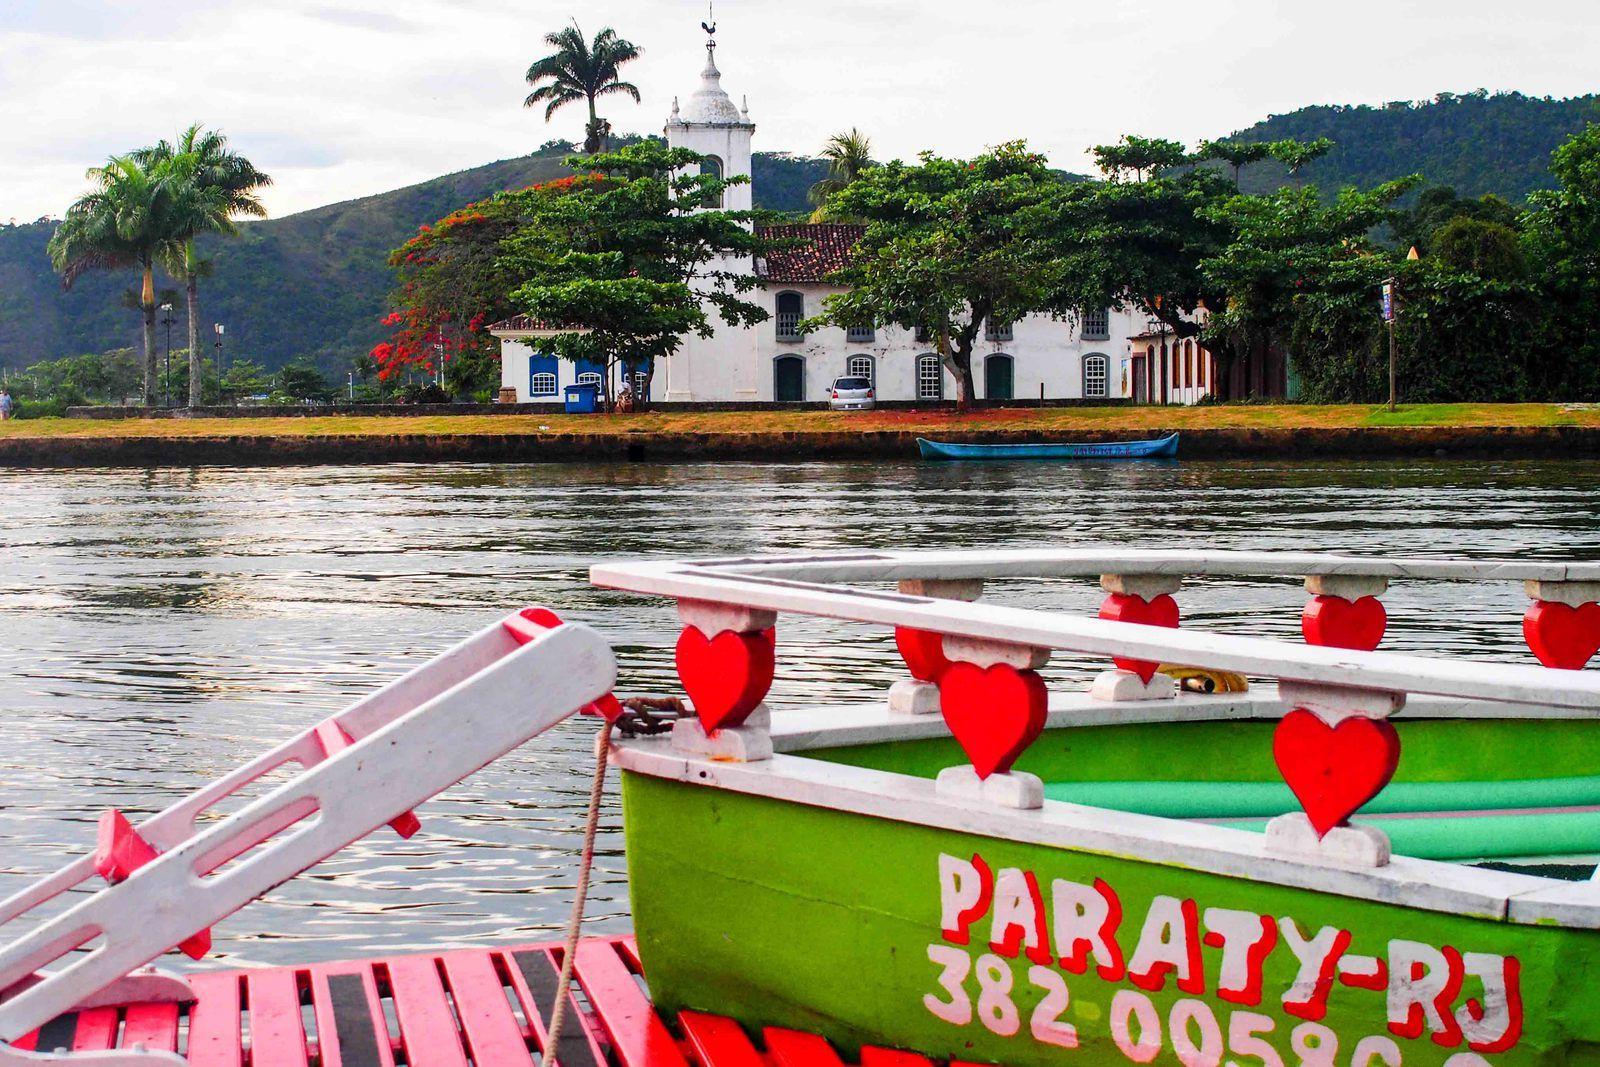 La Costa Verde